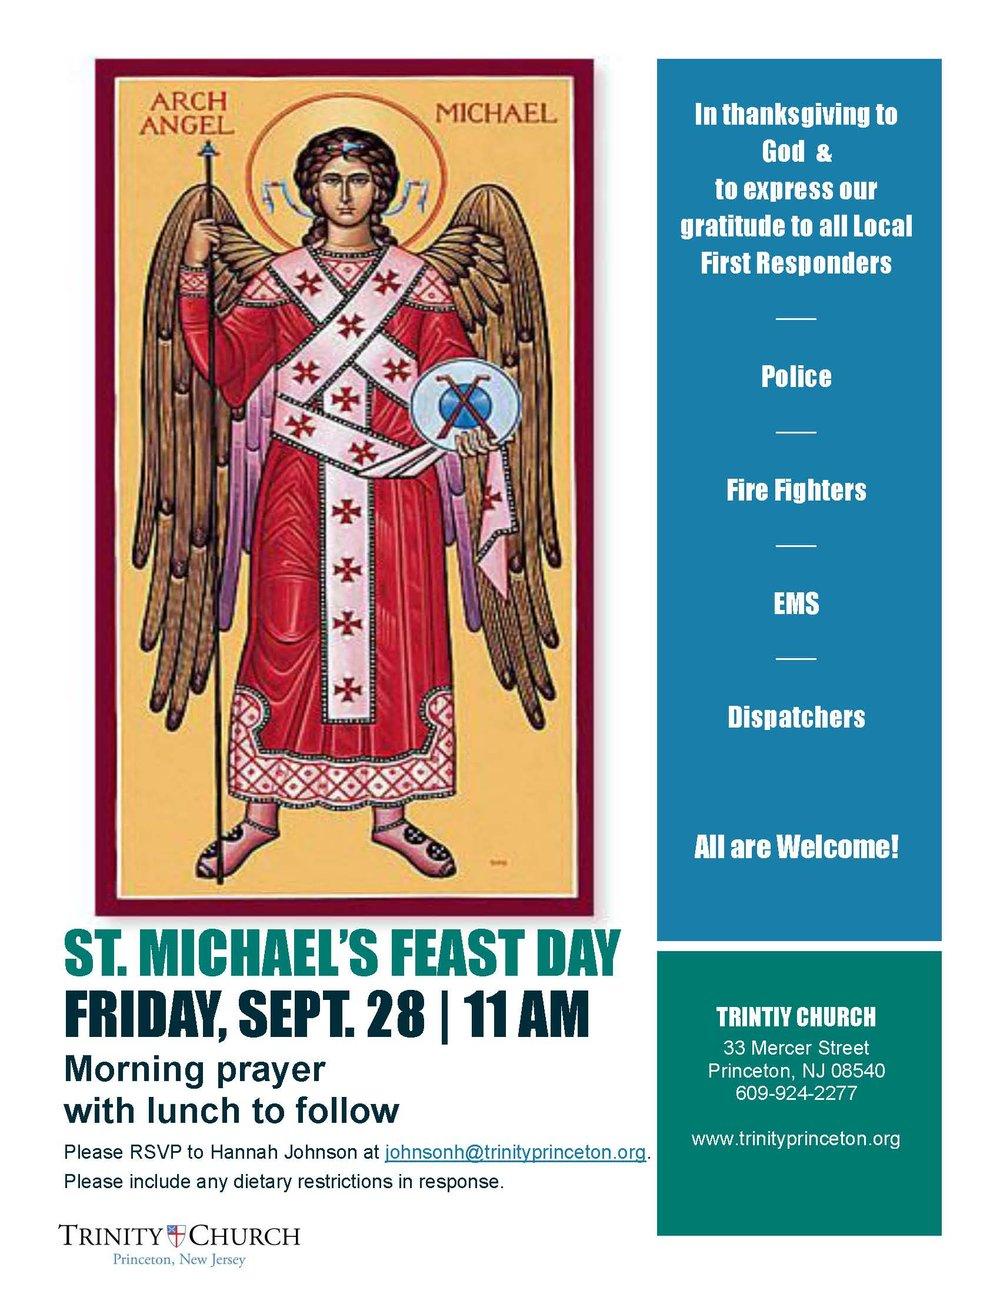 St. Michaels Feast Day 9-28-18.jpg